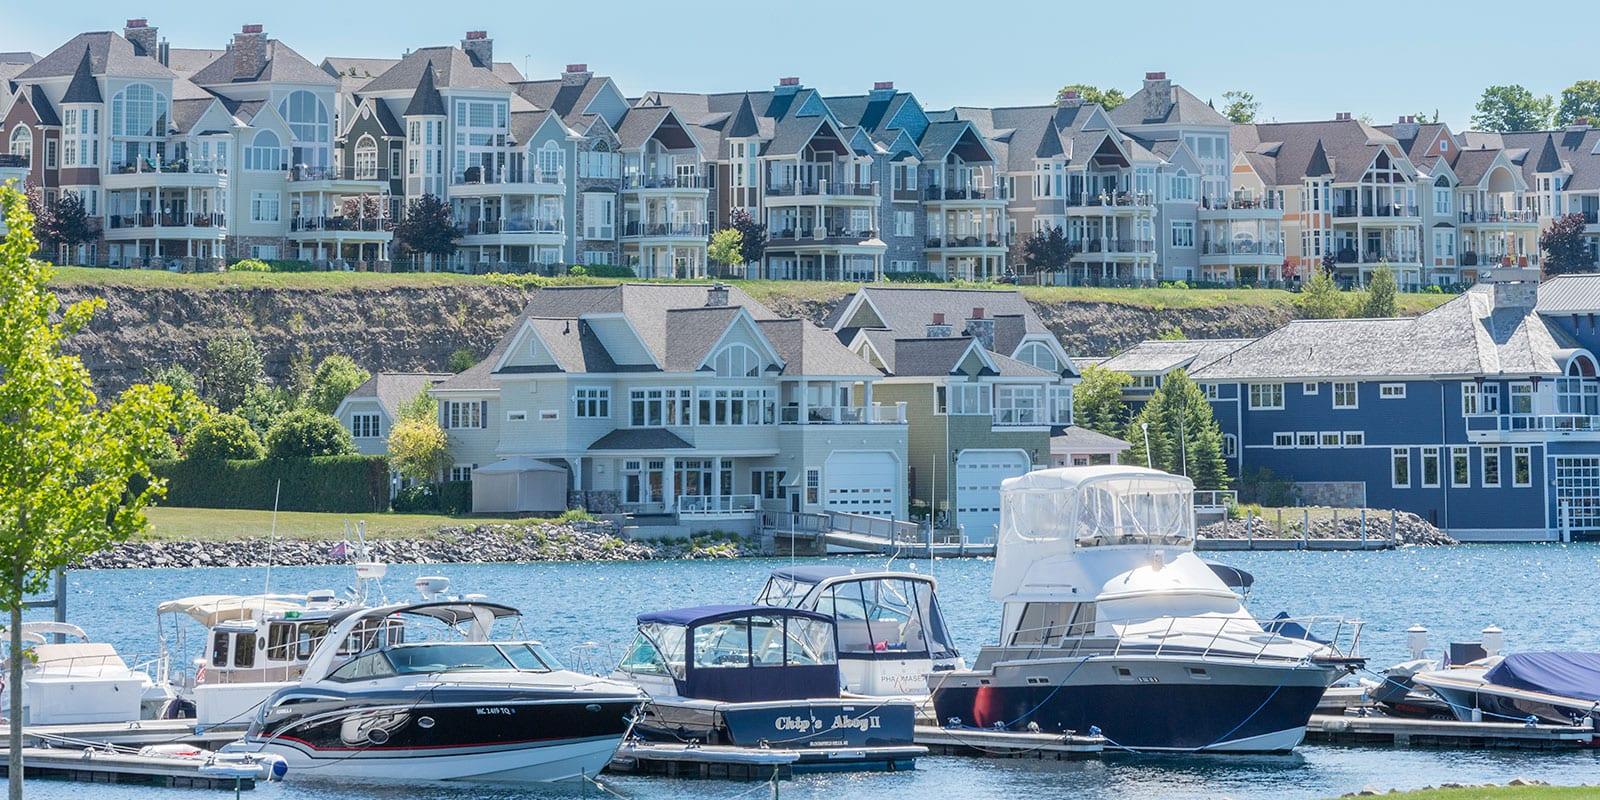 Explore Bay Harbor Product Shots